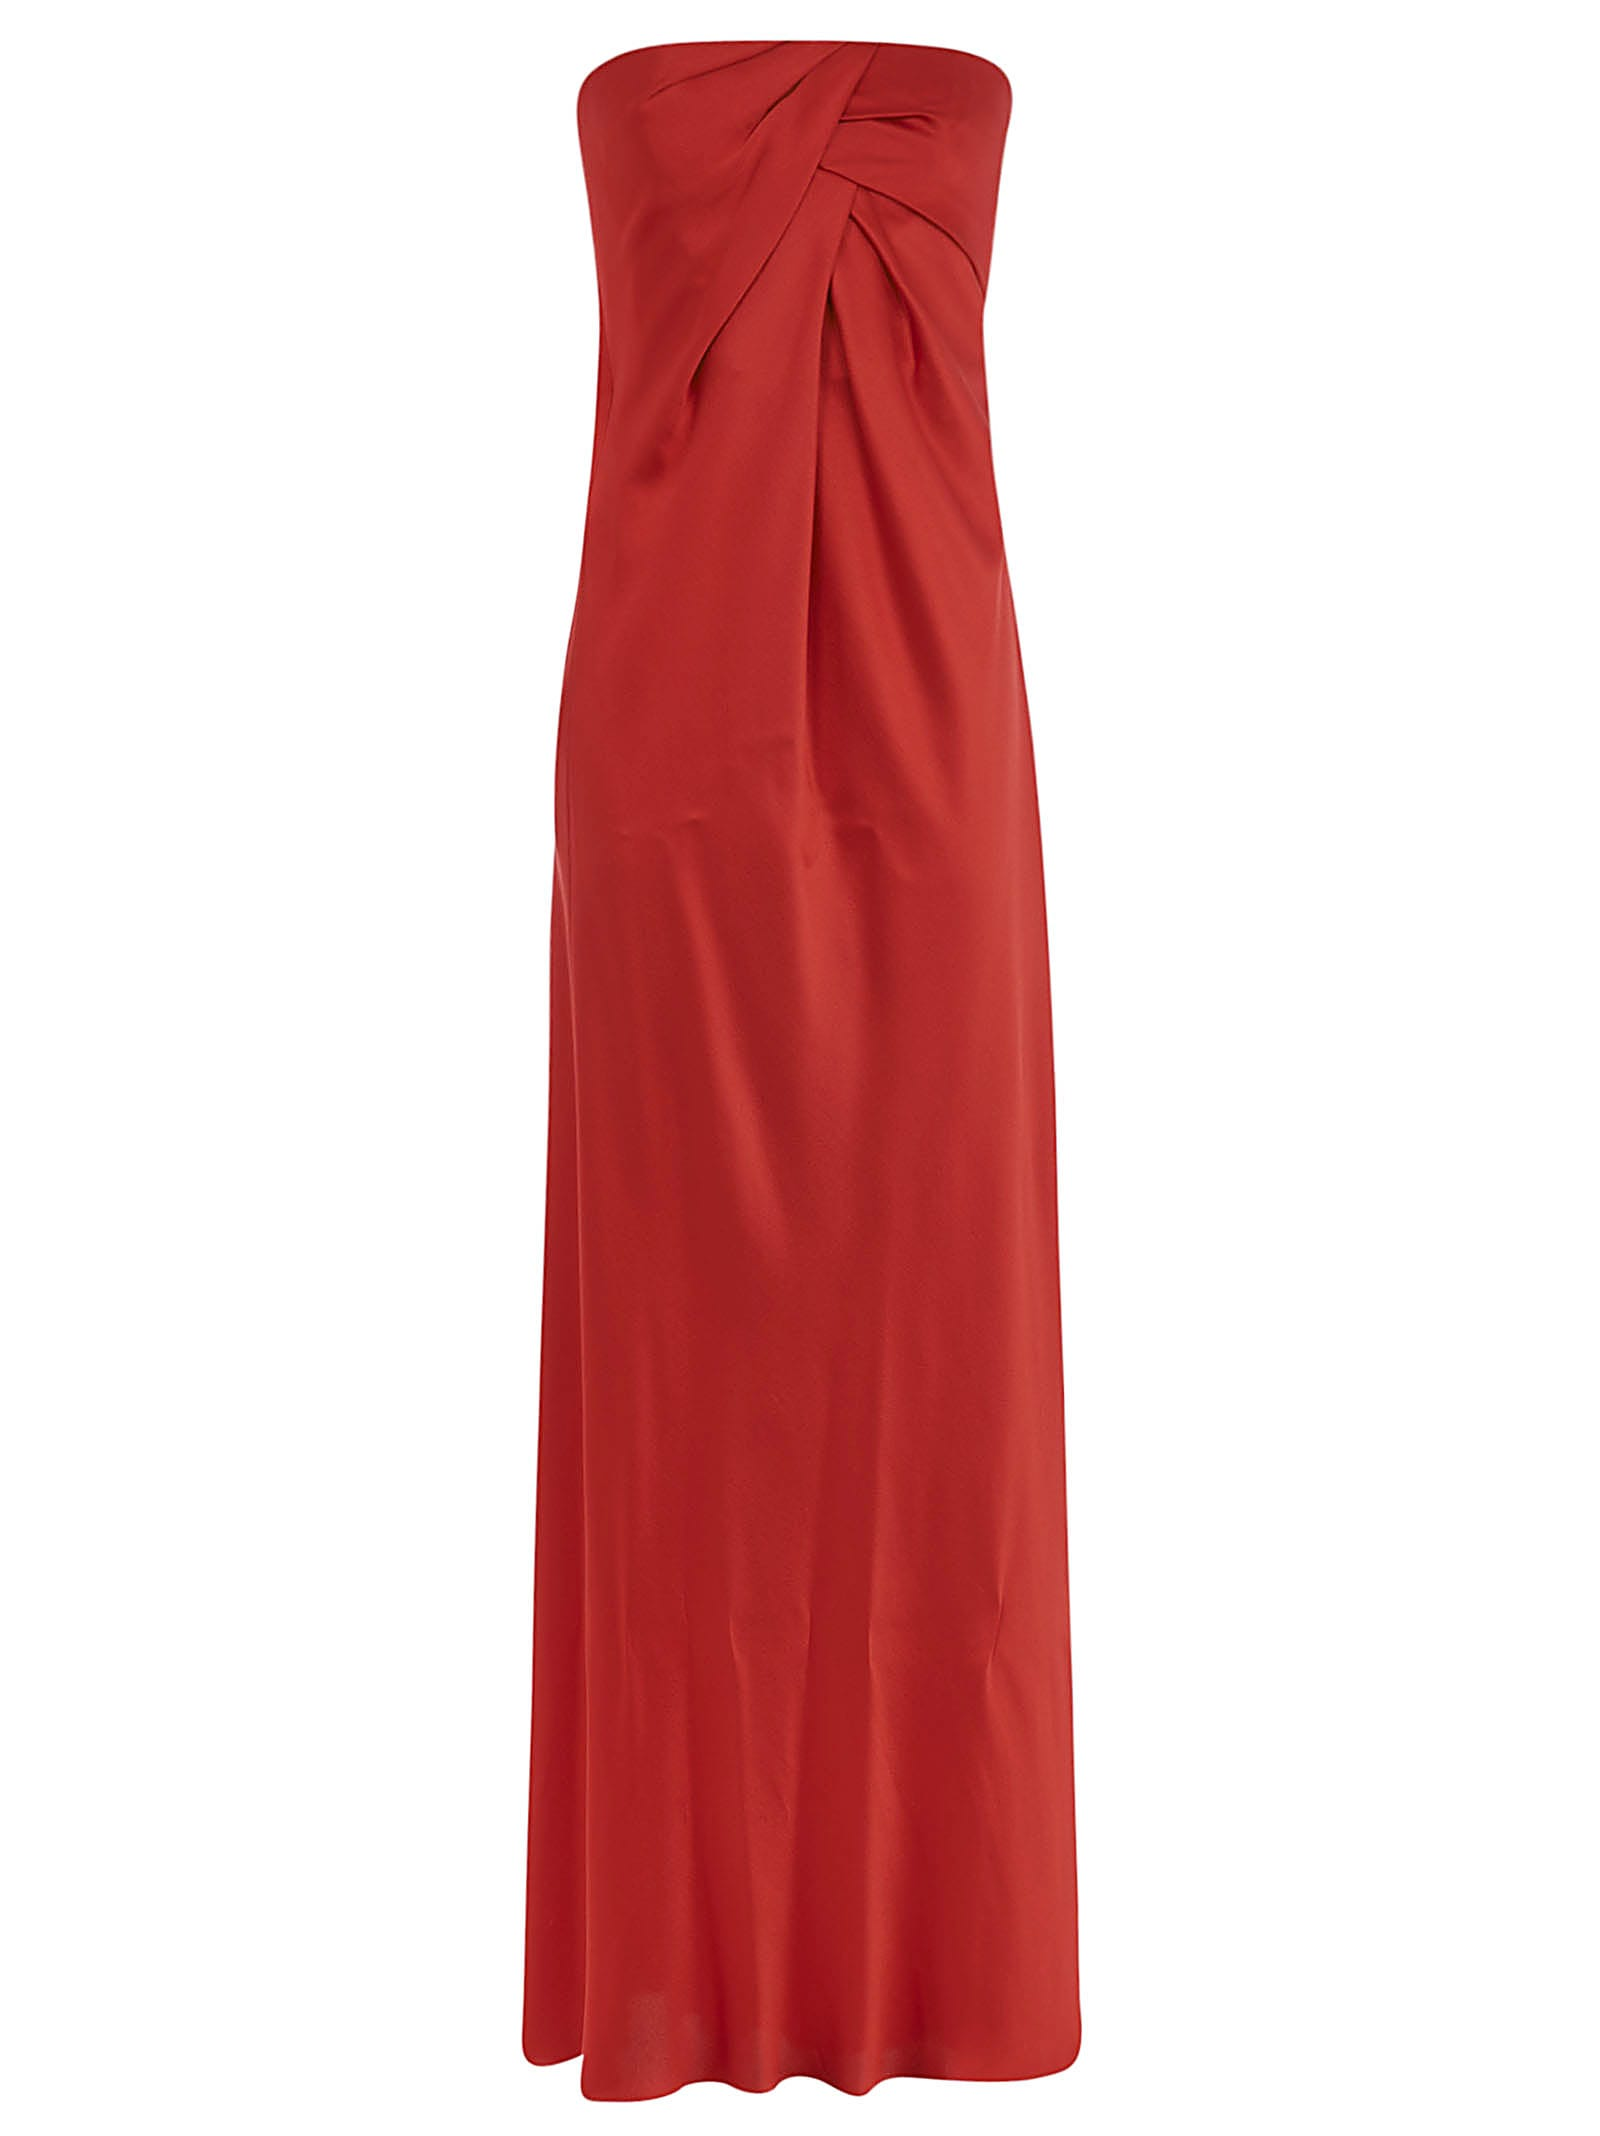 Buy Alberta Ferretti Draped Maxi Dress online, shop Alberta Ferretti with free shipping